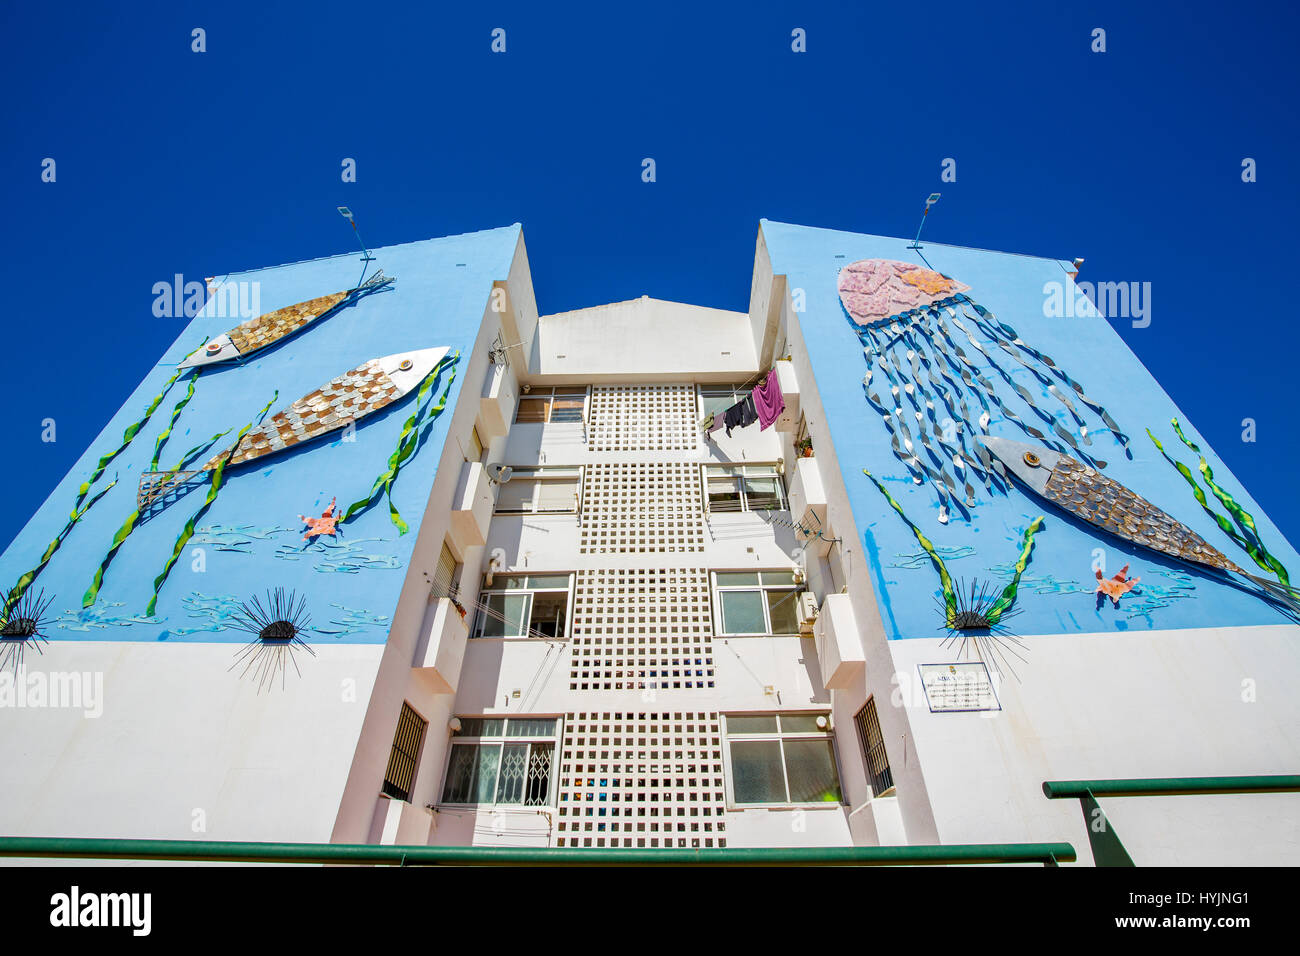 Artwork. Urban art that decorates the facade of an apartment building, Estepona. Malaga province Costa del Sol. - Stock Image